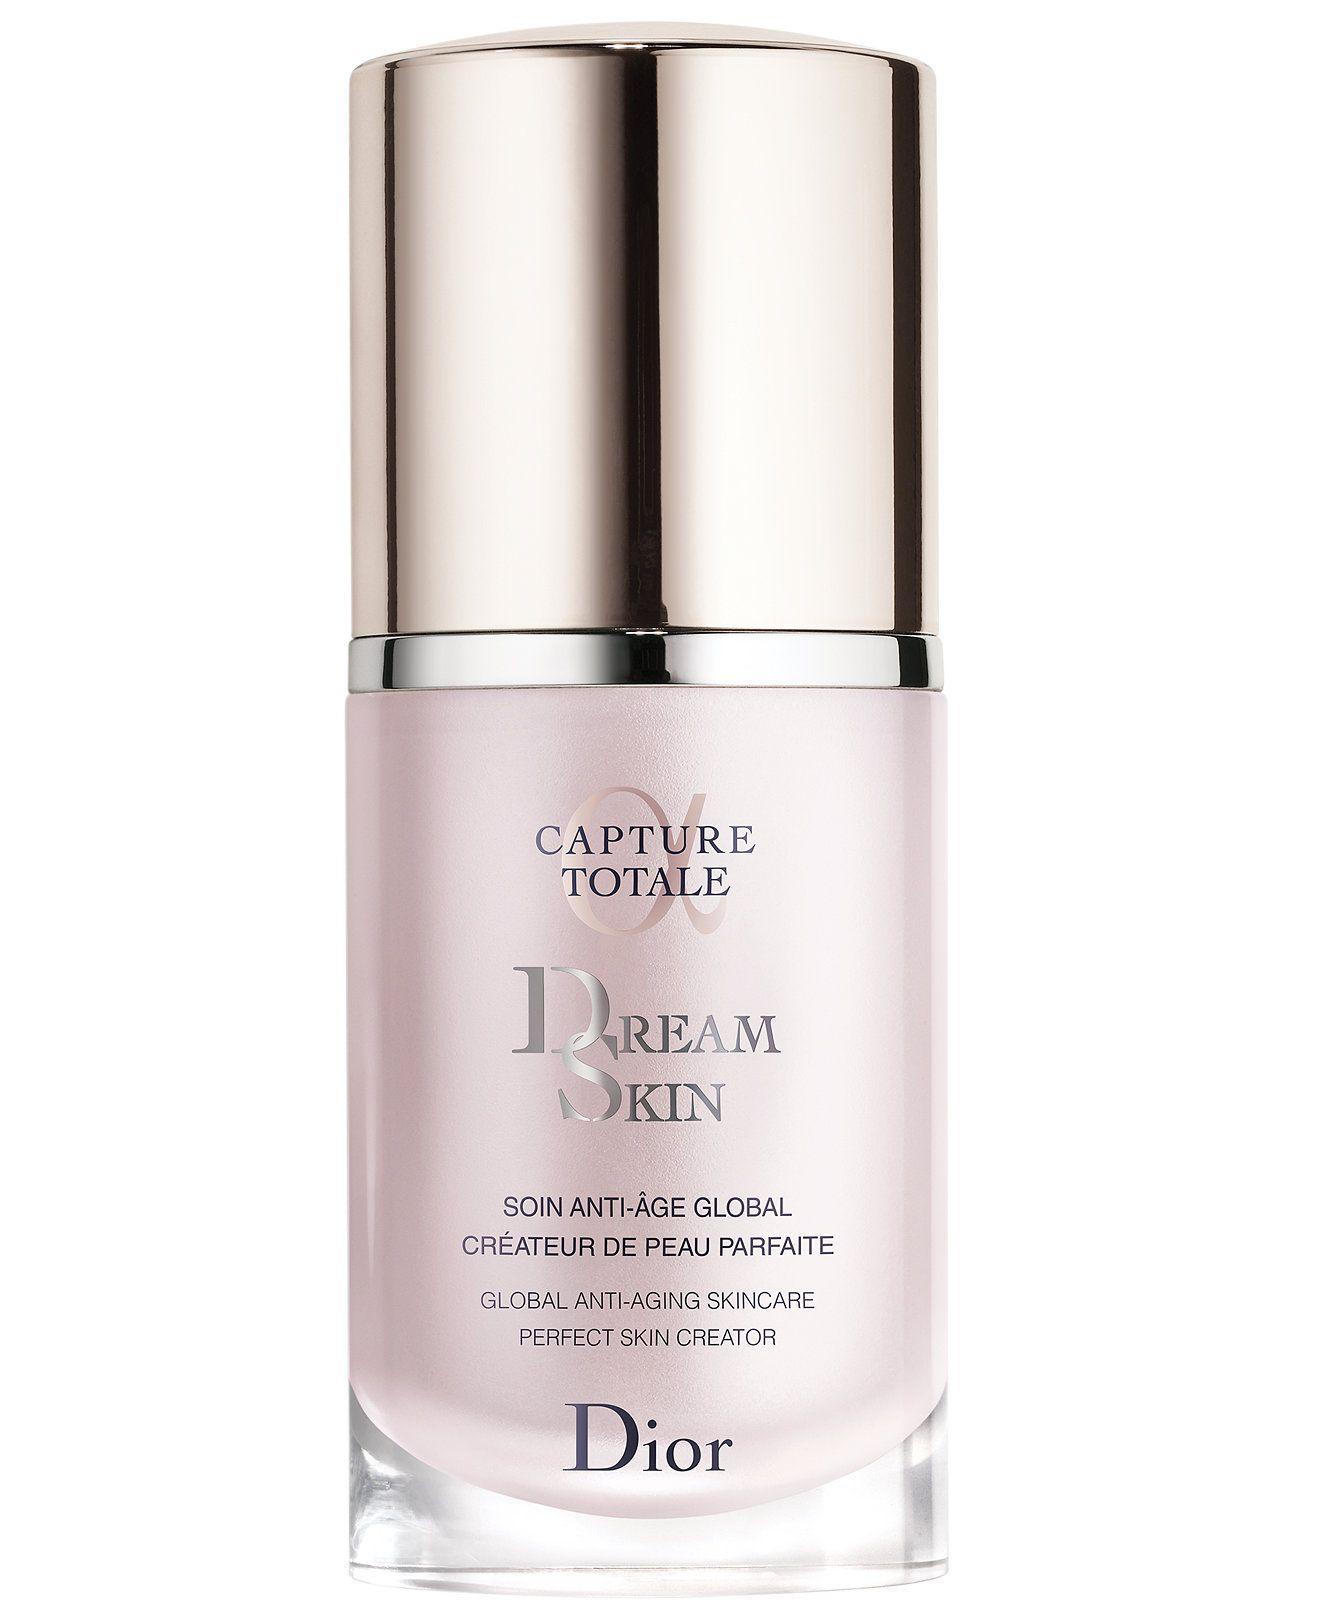 Dior Capture Totale Dreamskin 1 Oz Skin Care Beauty Macy S Dior Capture Totale Anti Aging Skin Products Dior Skincare